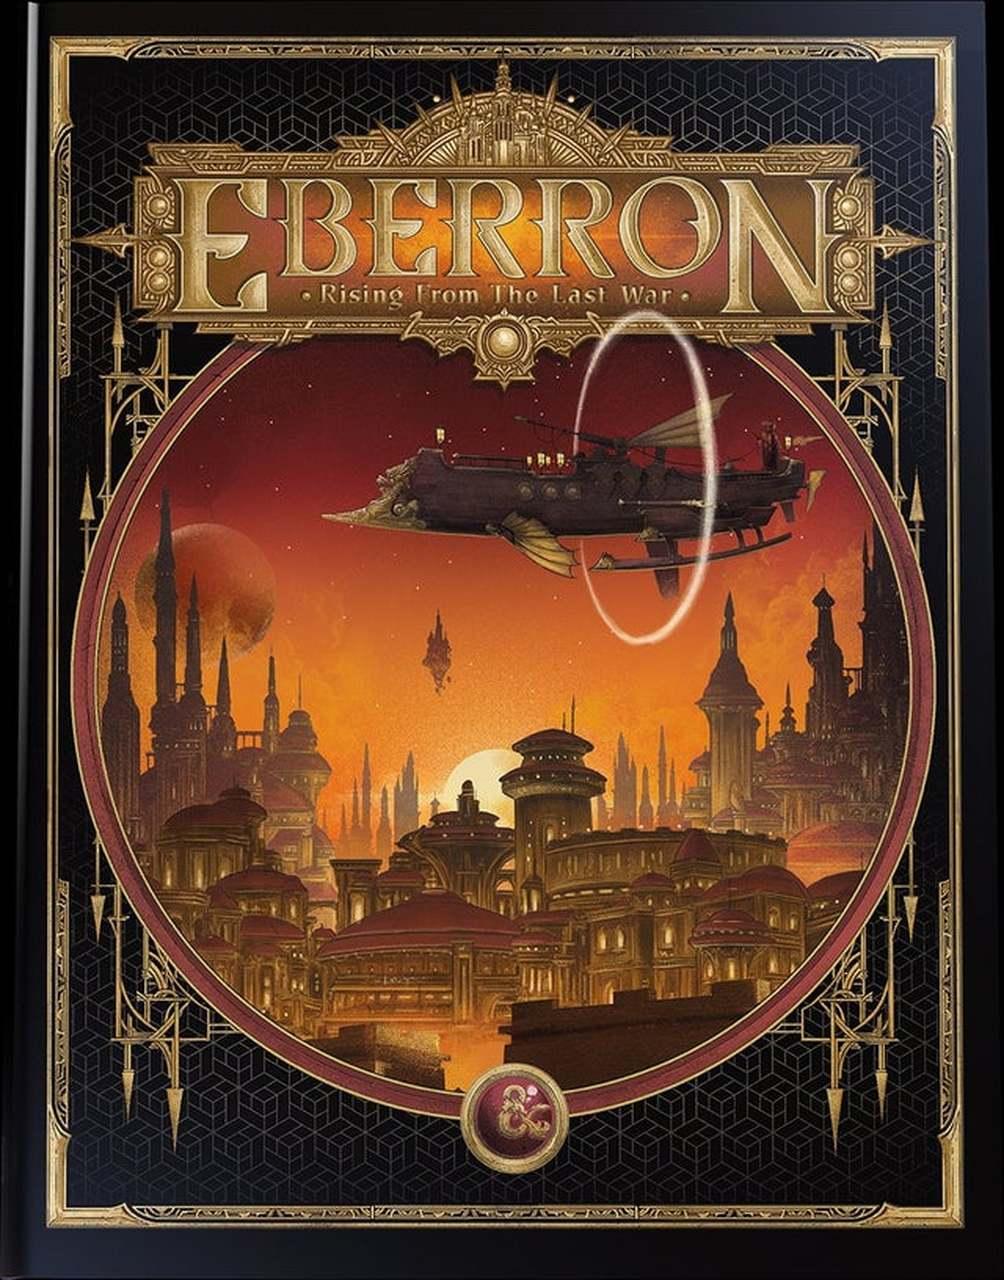 Dungeons and Dragons RPG 5th edizione Eberron Rising dall/'ultima guerra in magazzino!